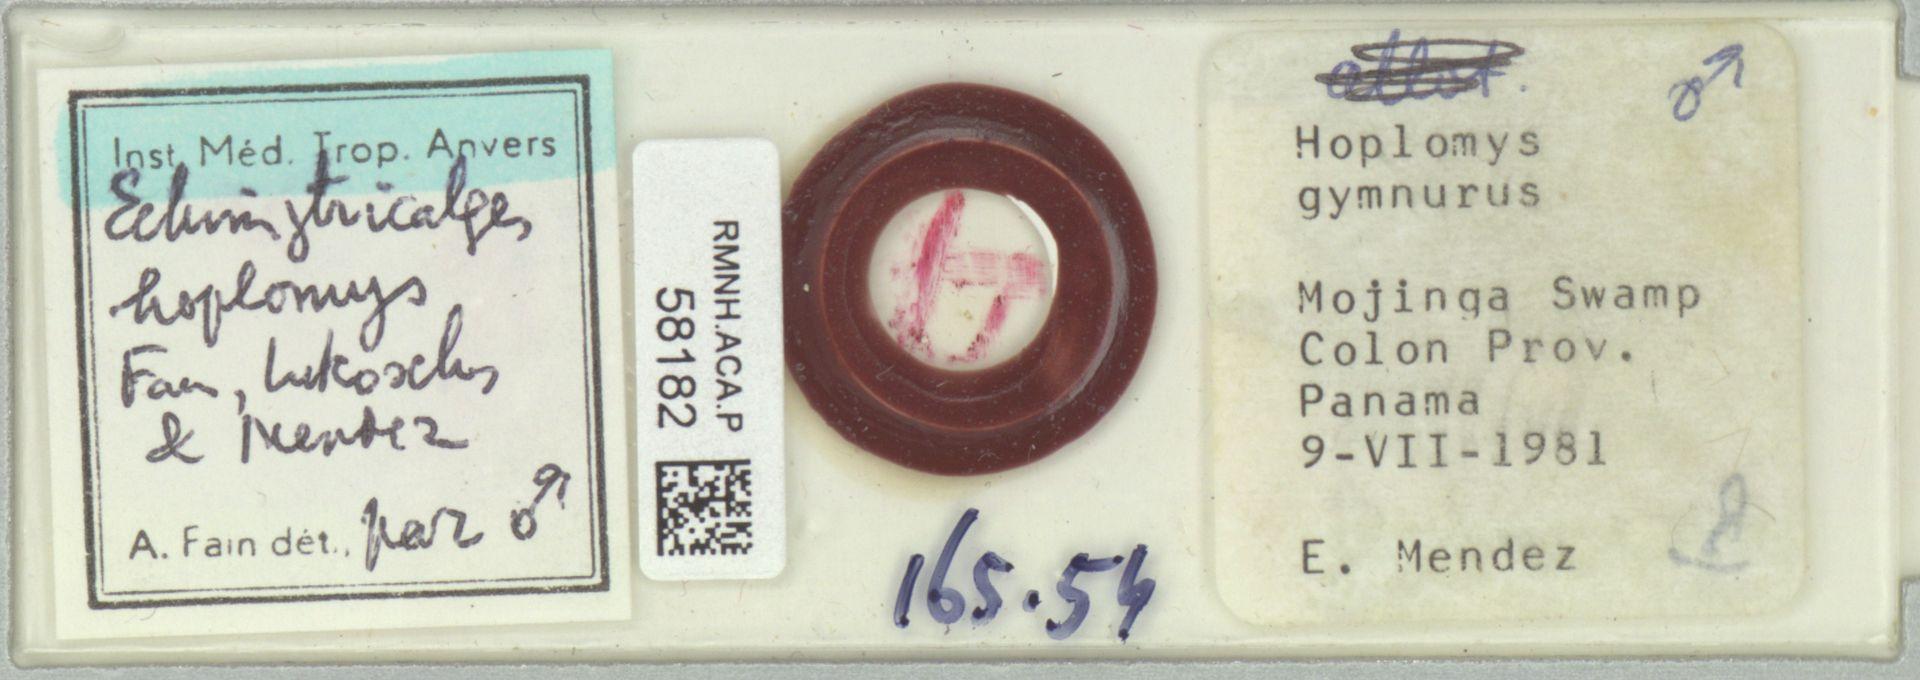 RMNH.ACA.P.58182 | Echimytricalges hoplomys Fain, Lukoschus & Mendez